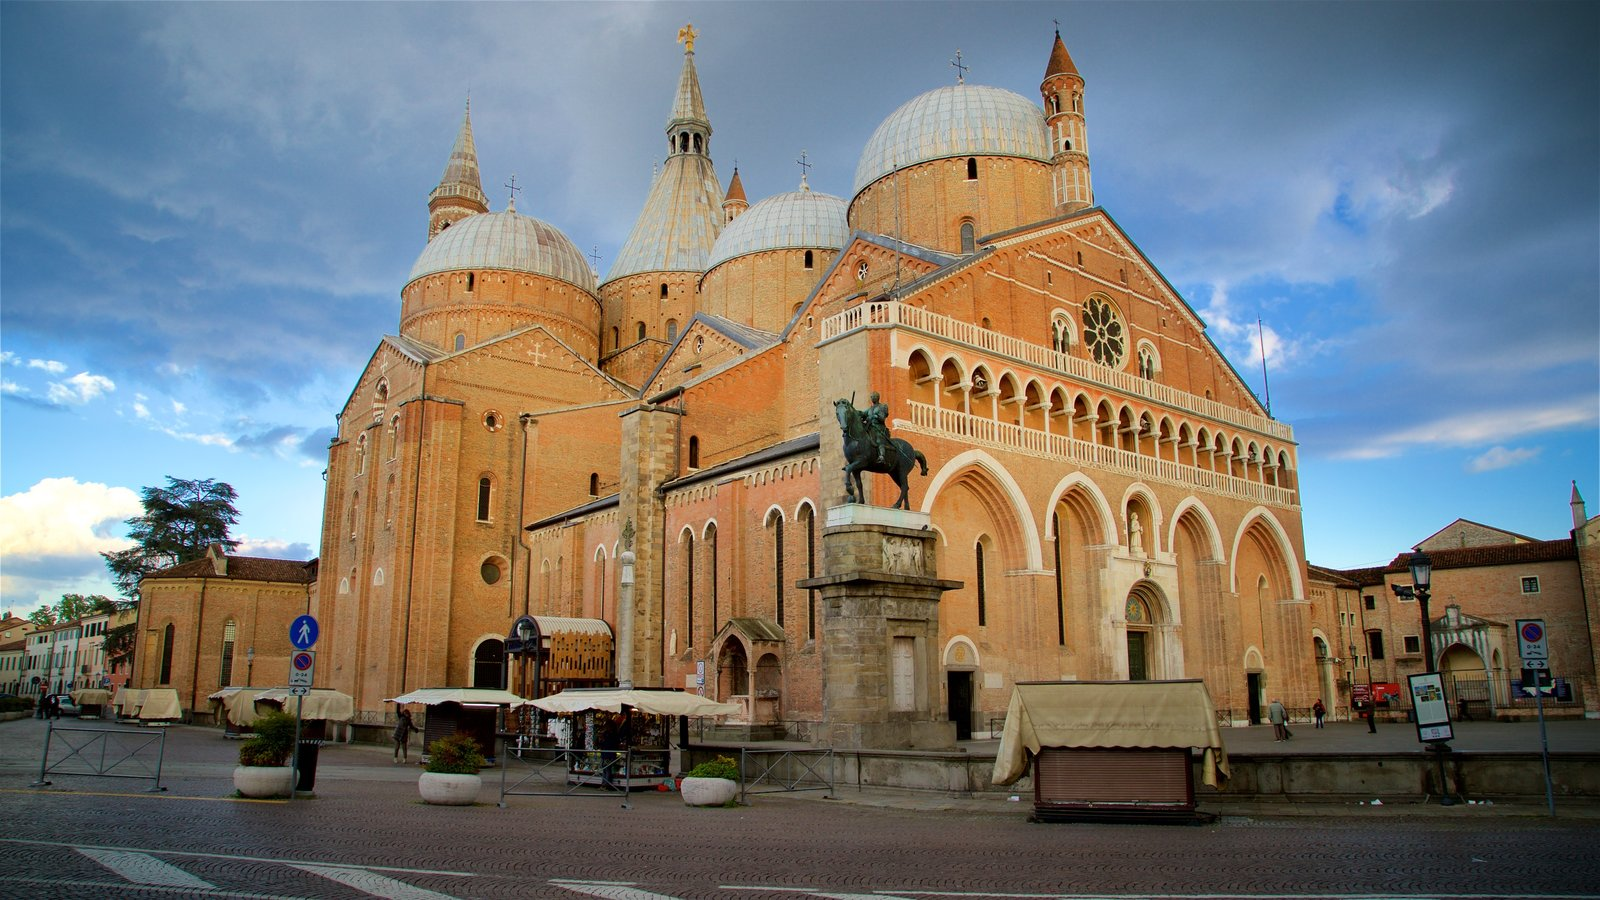 Basilica di Sant\'Antonio da Padova showing a church or cathedral, heritage architecture and a statue or sculpture